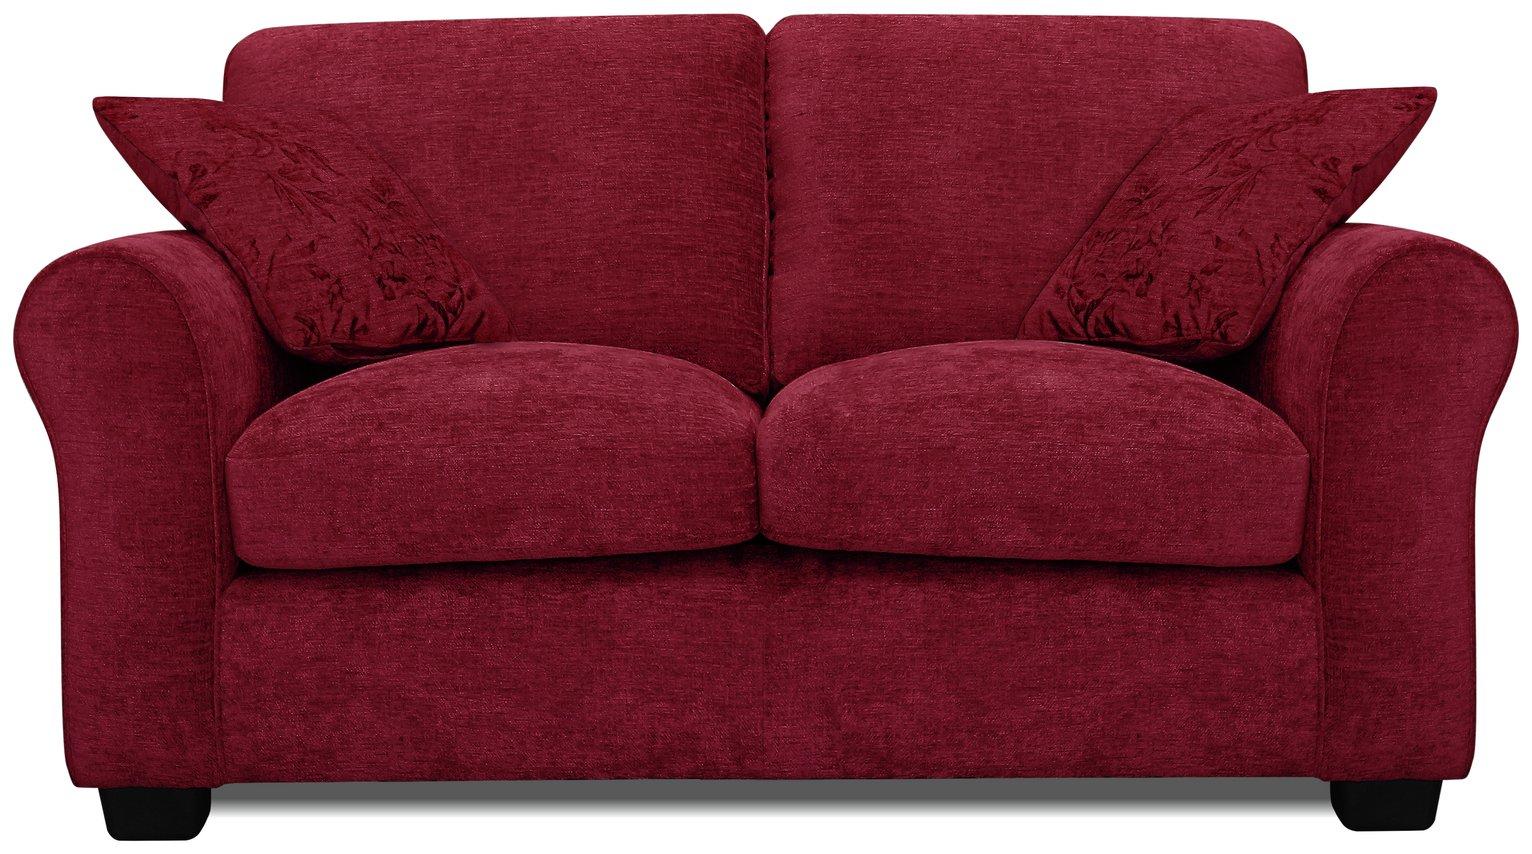 Argos Home Tammy 2 Seater Fabric Sofa - Wine